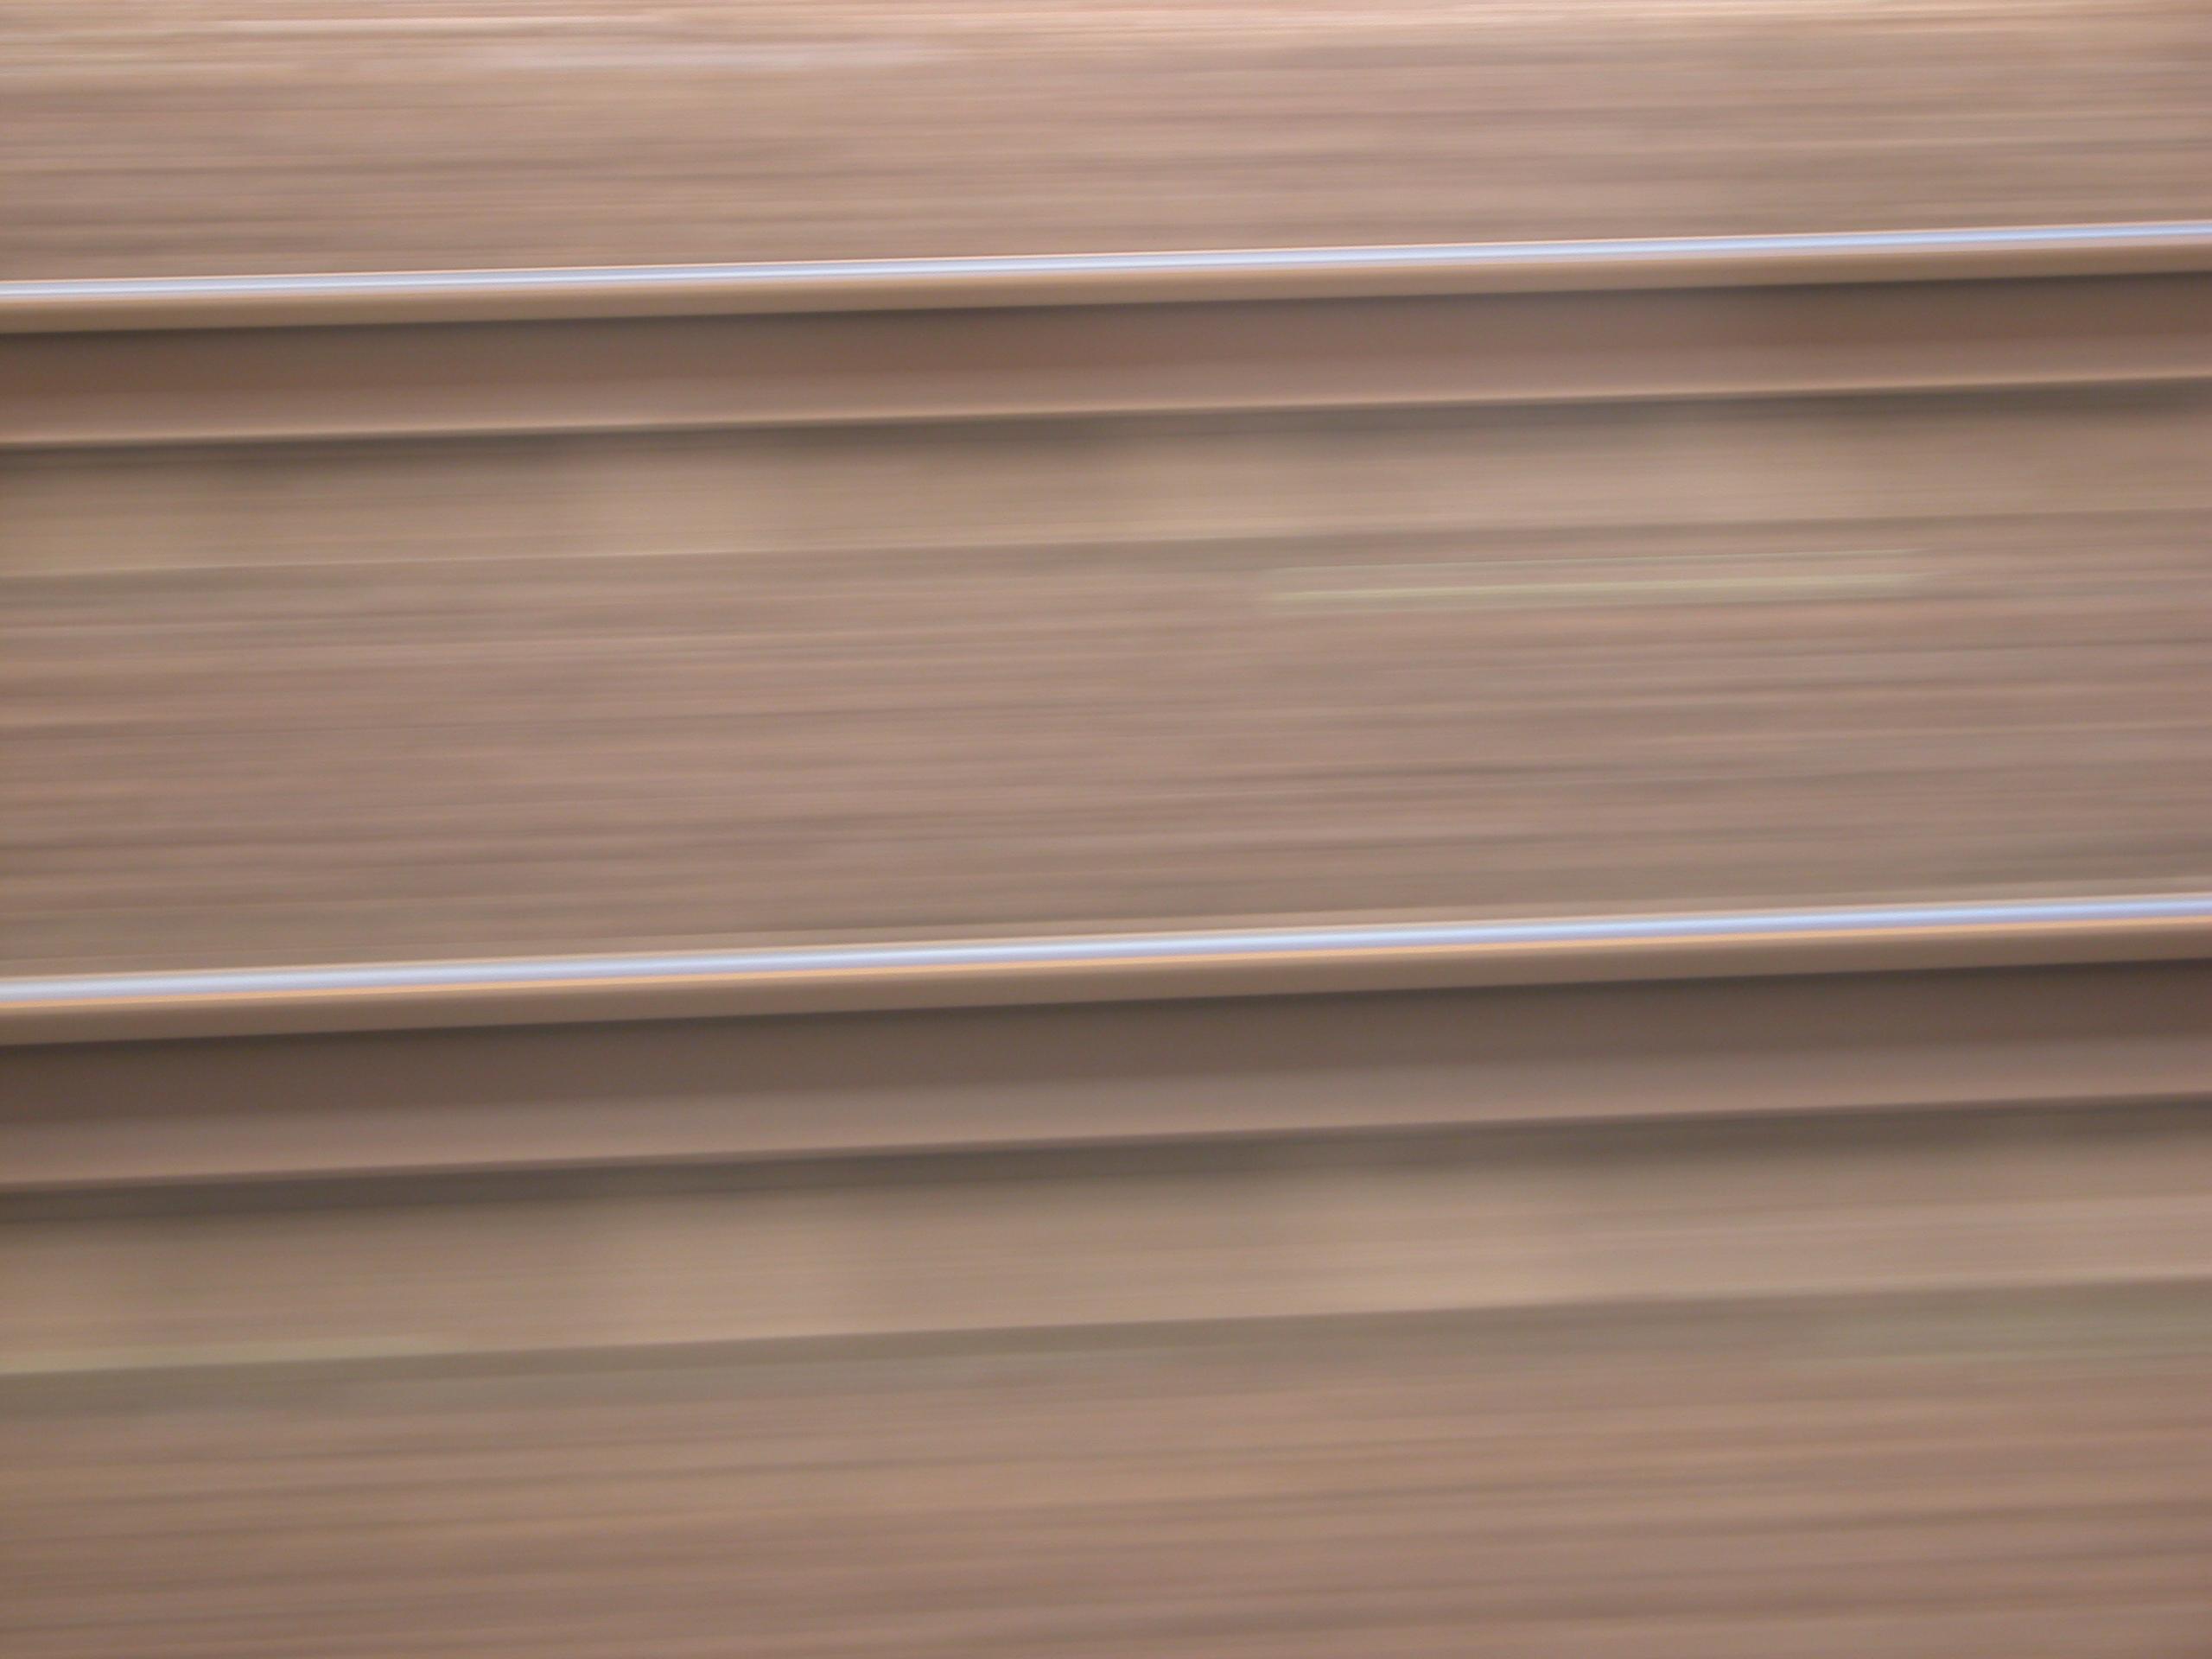 blur whizzing by traintracks rail rails speed fast blazing